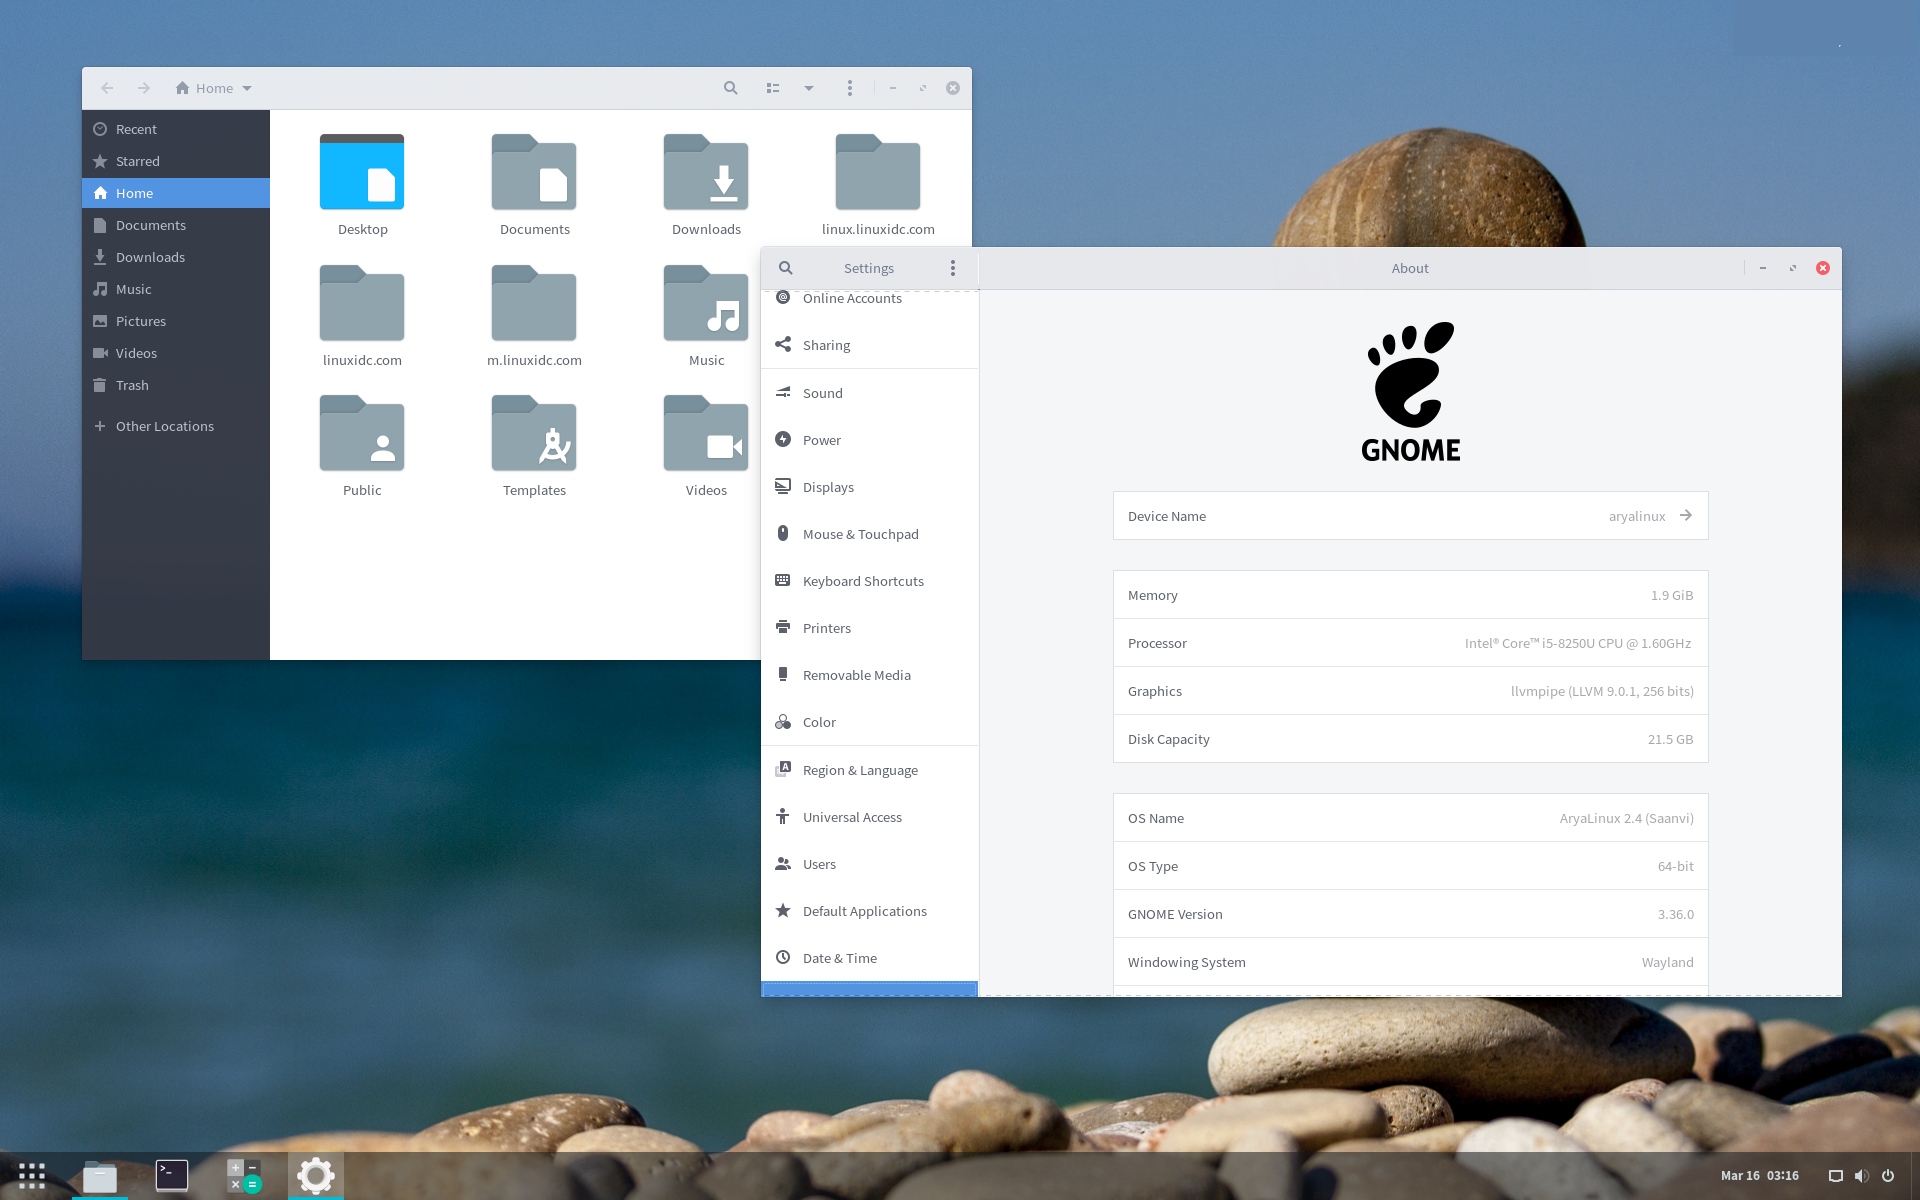 AryaLinux 2.4 正式发布AryaLinux 2.4 正式发布